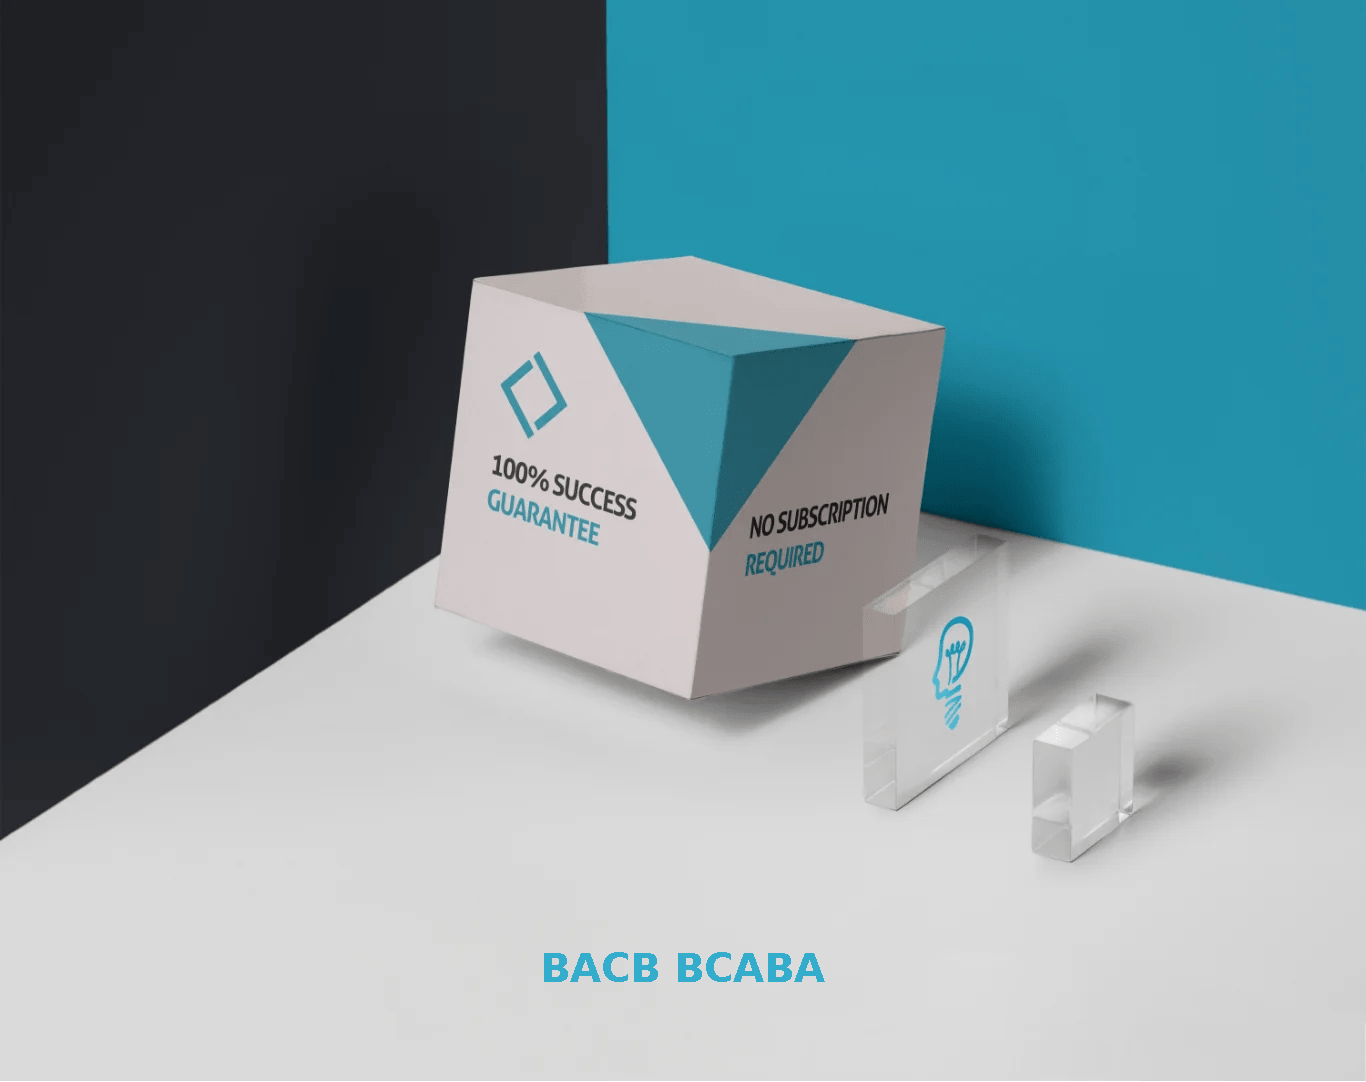 BACB BCABA Exams